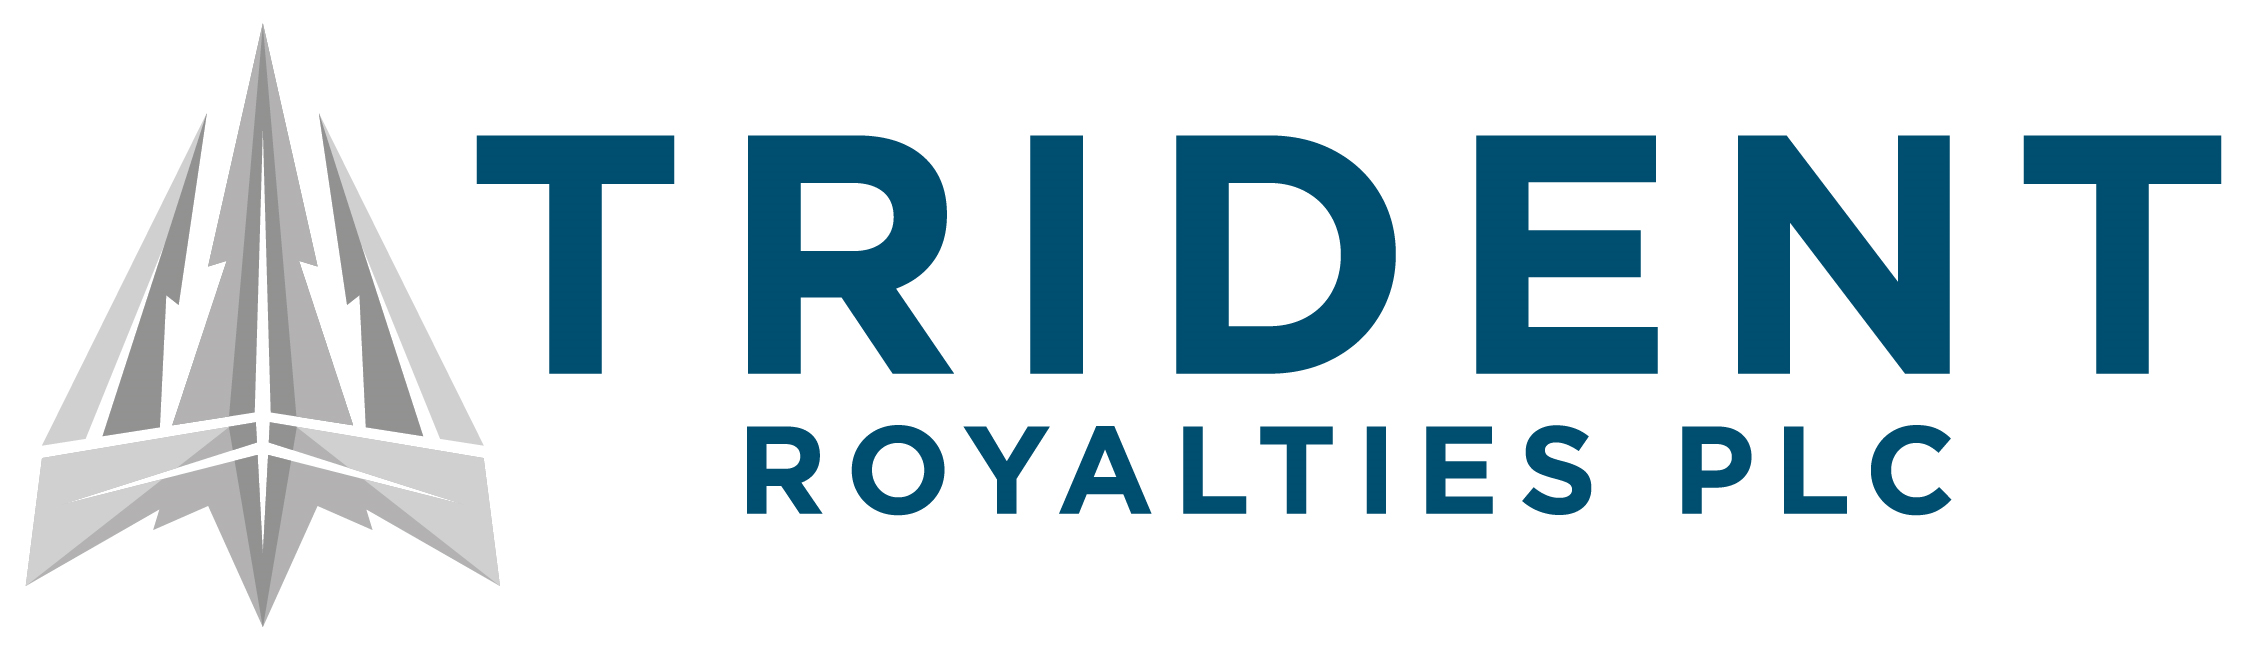 Trident Royalties PLC Logo